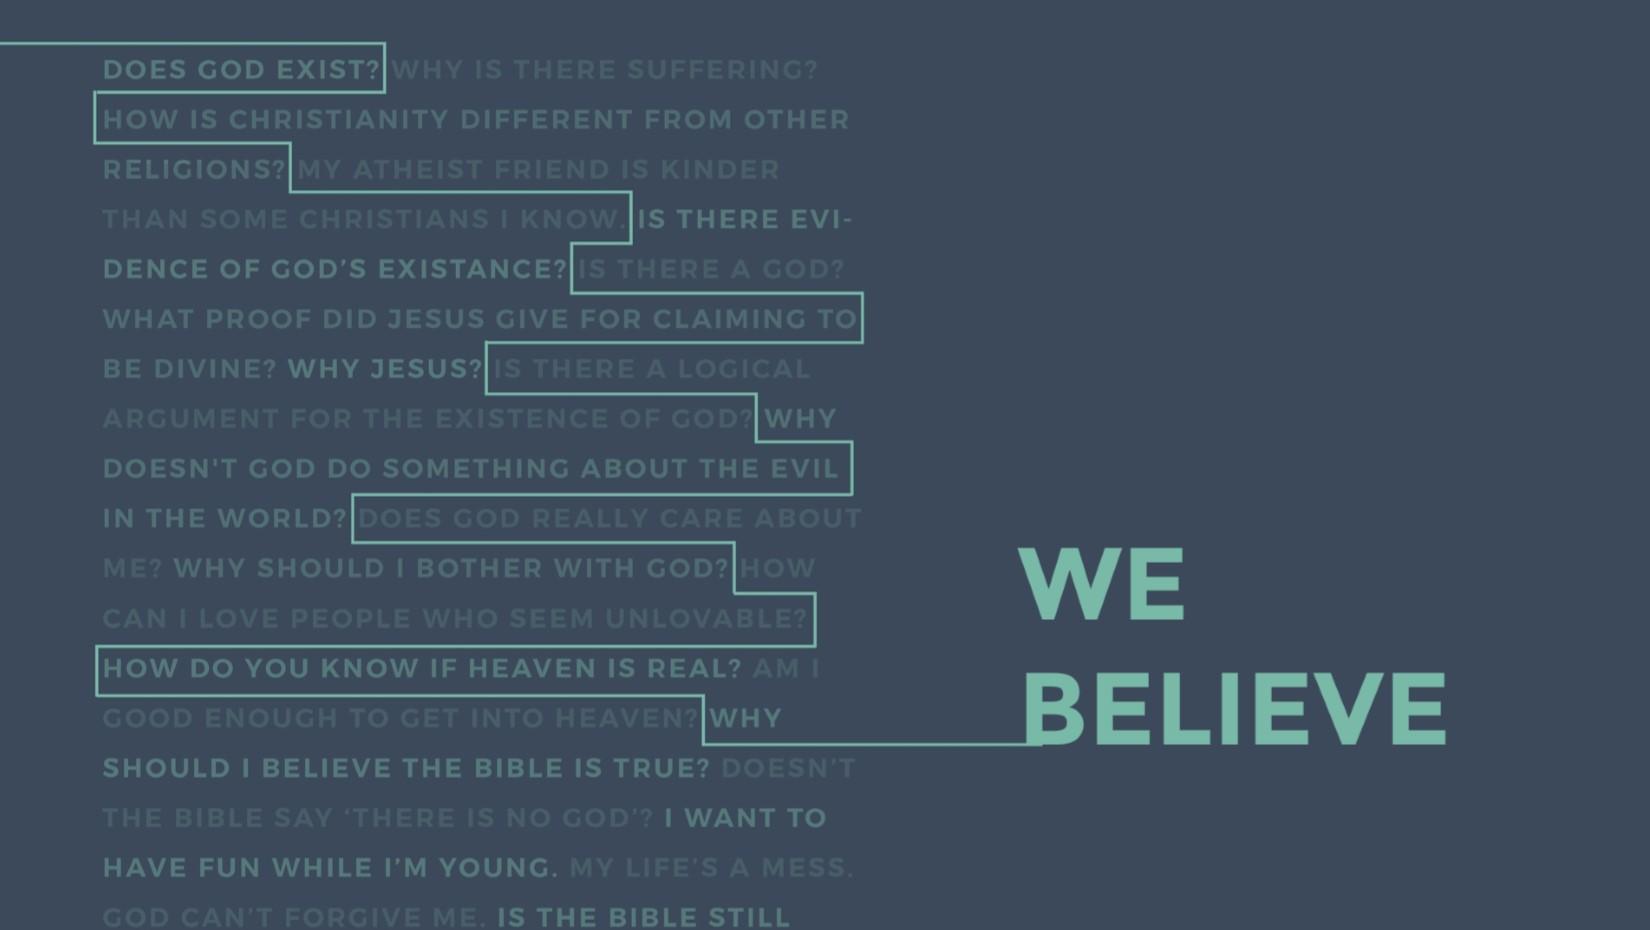 01 31 2021 We Believe: The Church